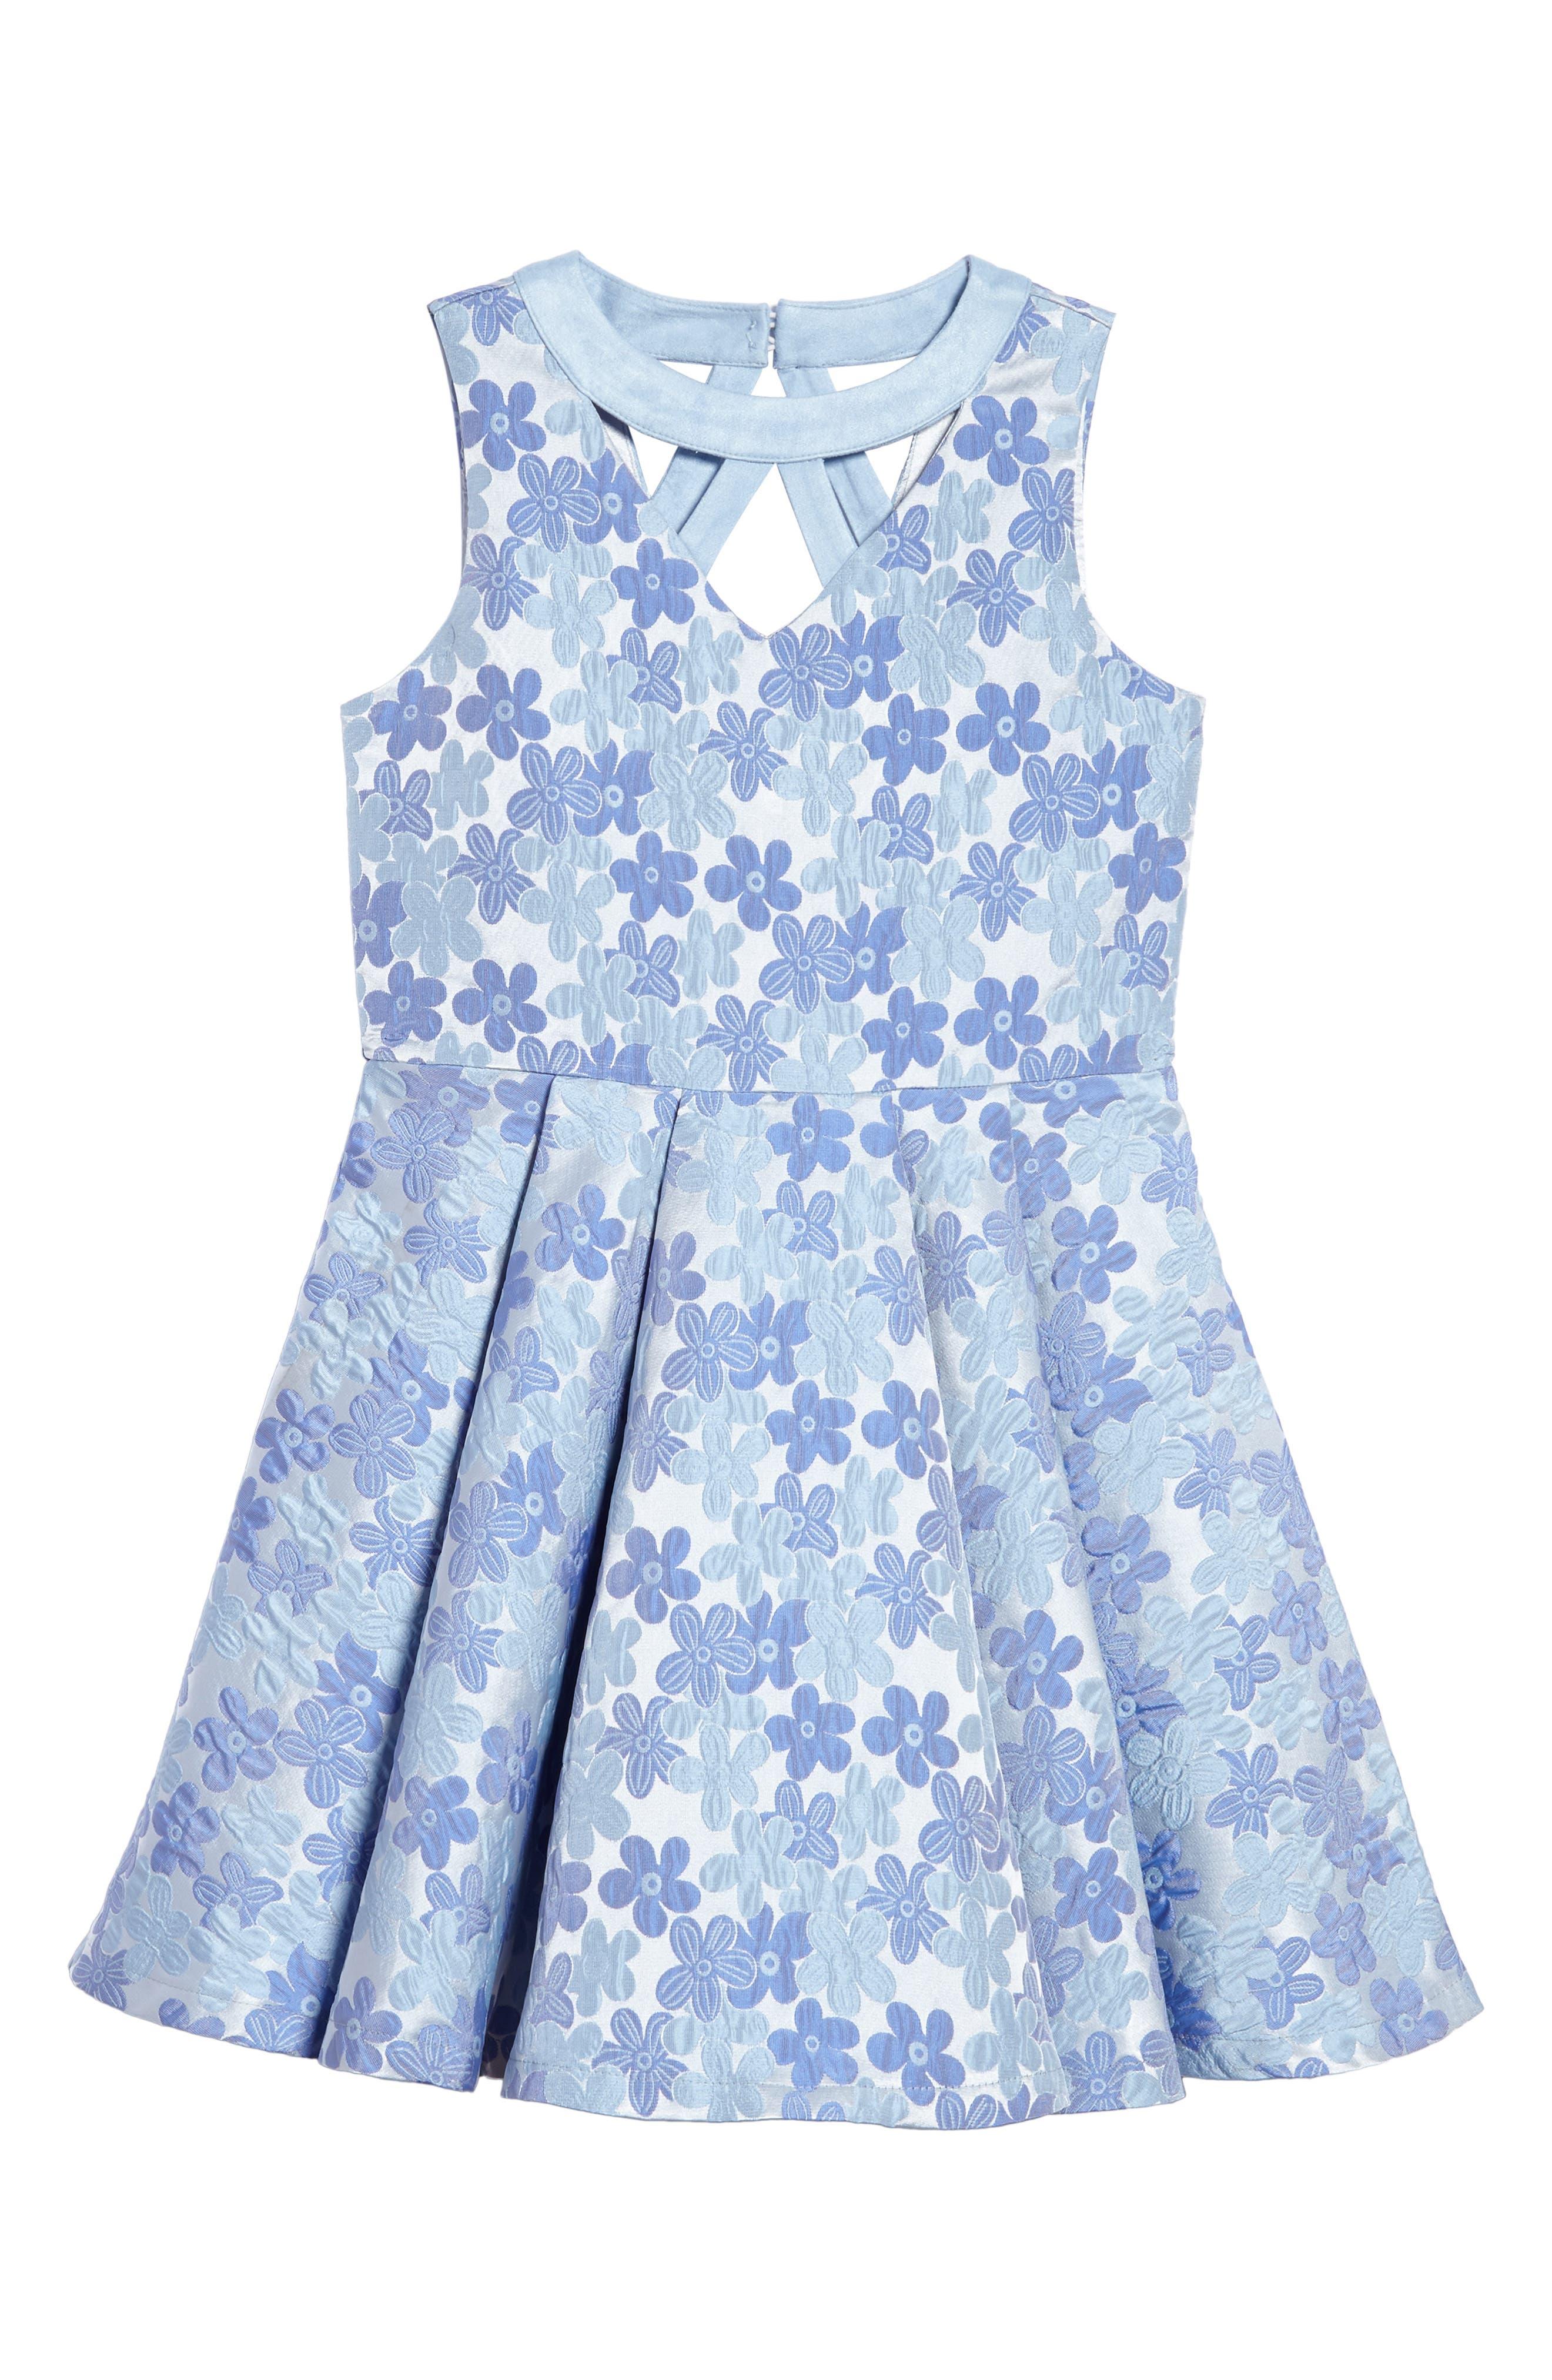 Alternate Image 1 Selected - Elisa B Daisy Brocade Fit & Flare Dress (Big Girls)